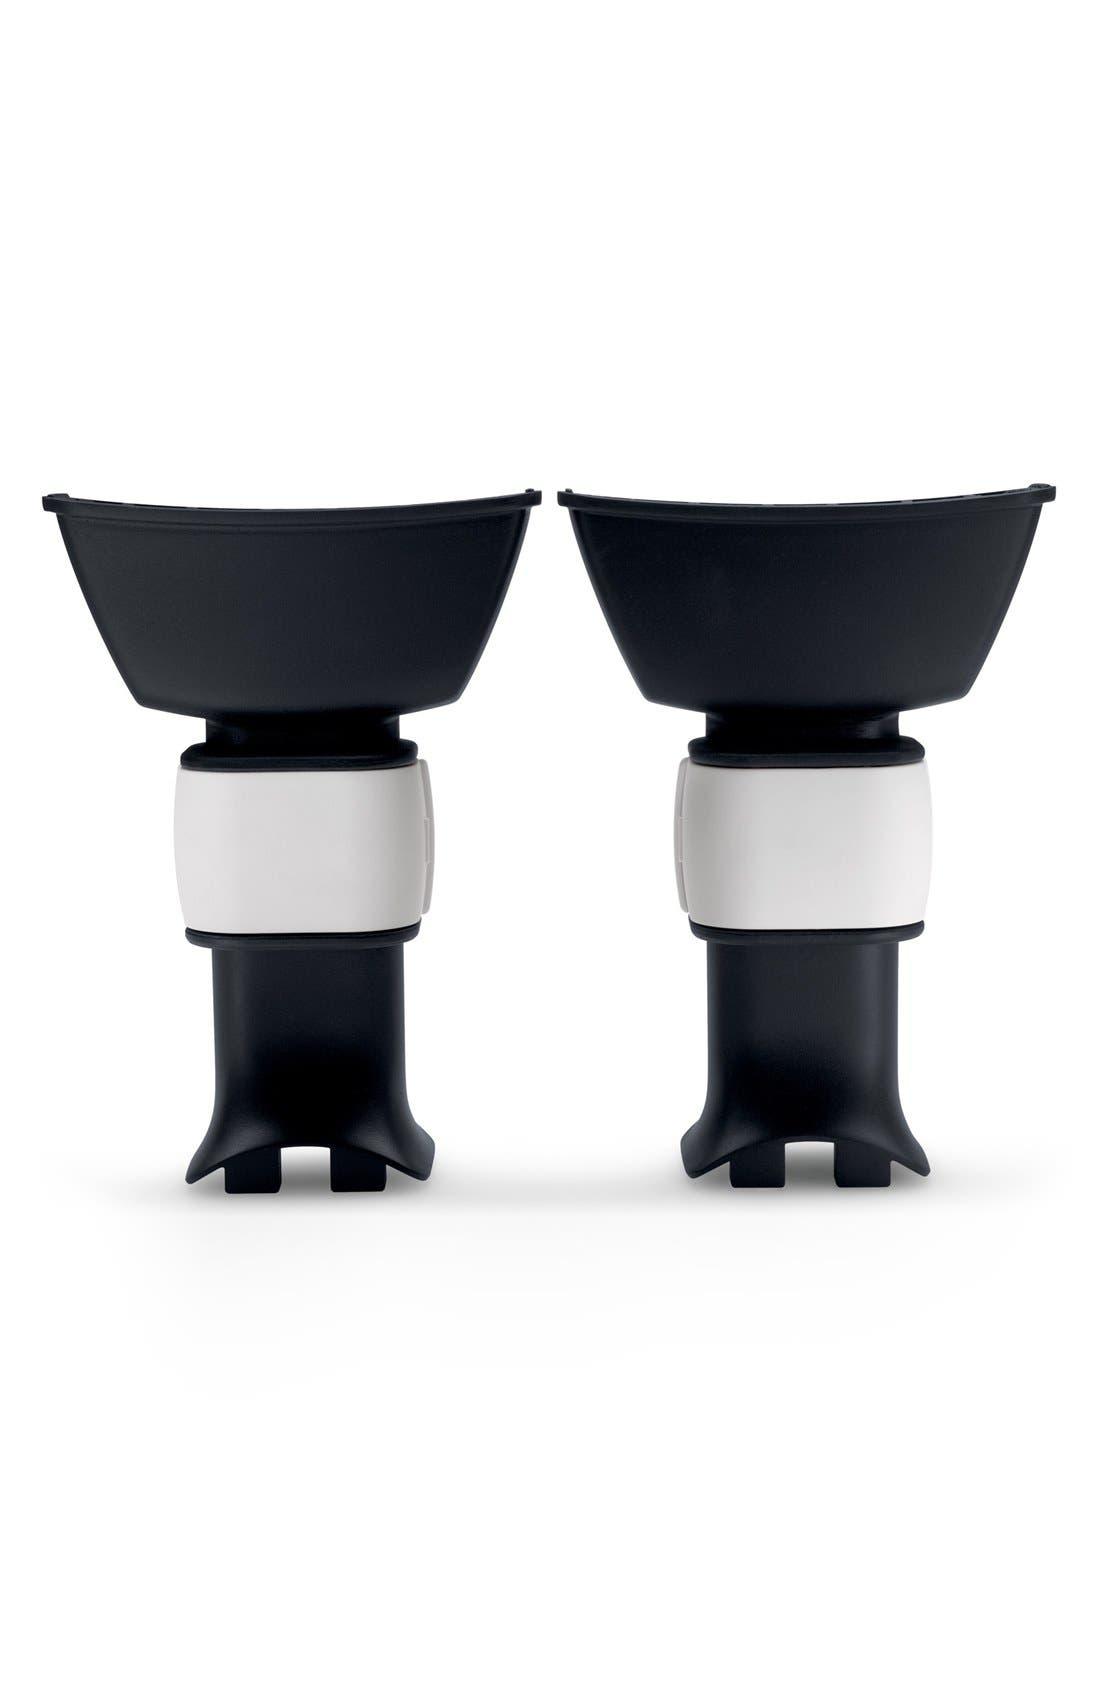 Bugaboo 'Cameleon' Stroller to Britax-Römer® Car Seat Adapter